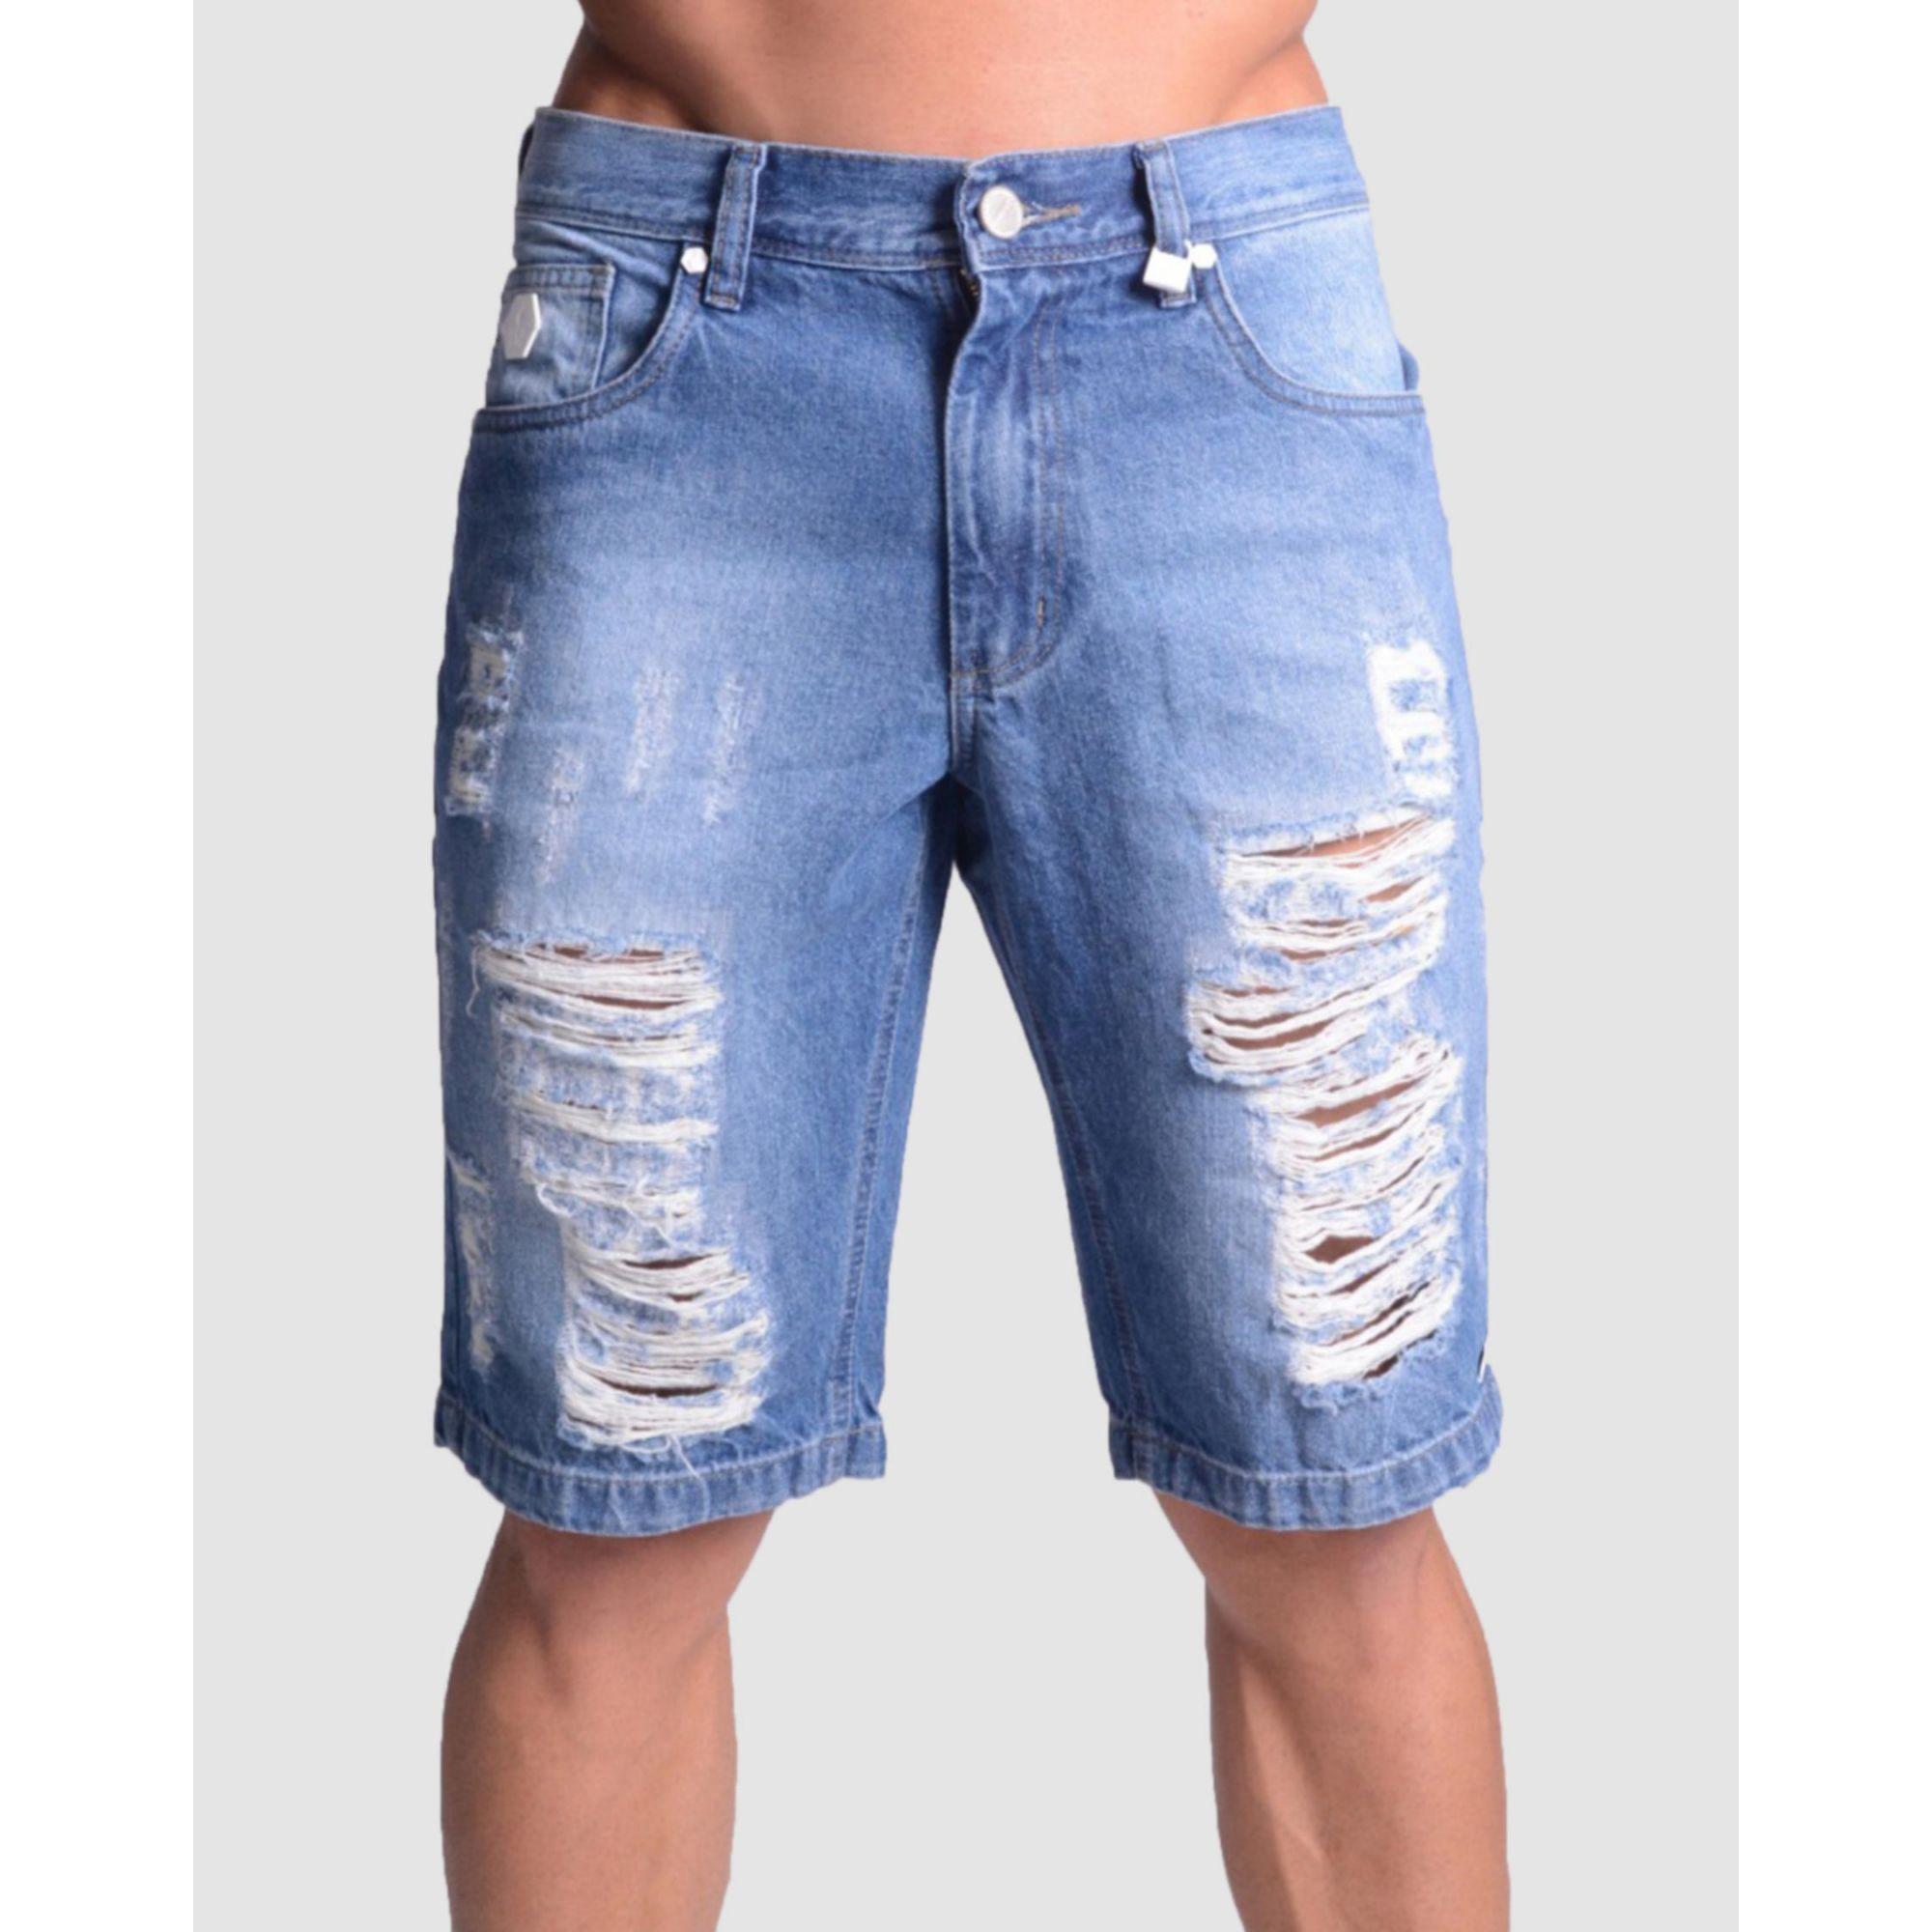 Bermuda Buh Jeans Azul Clara